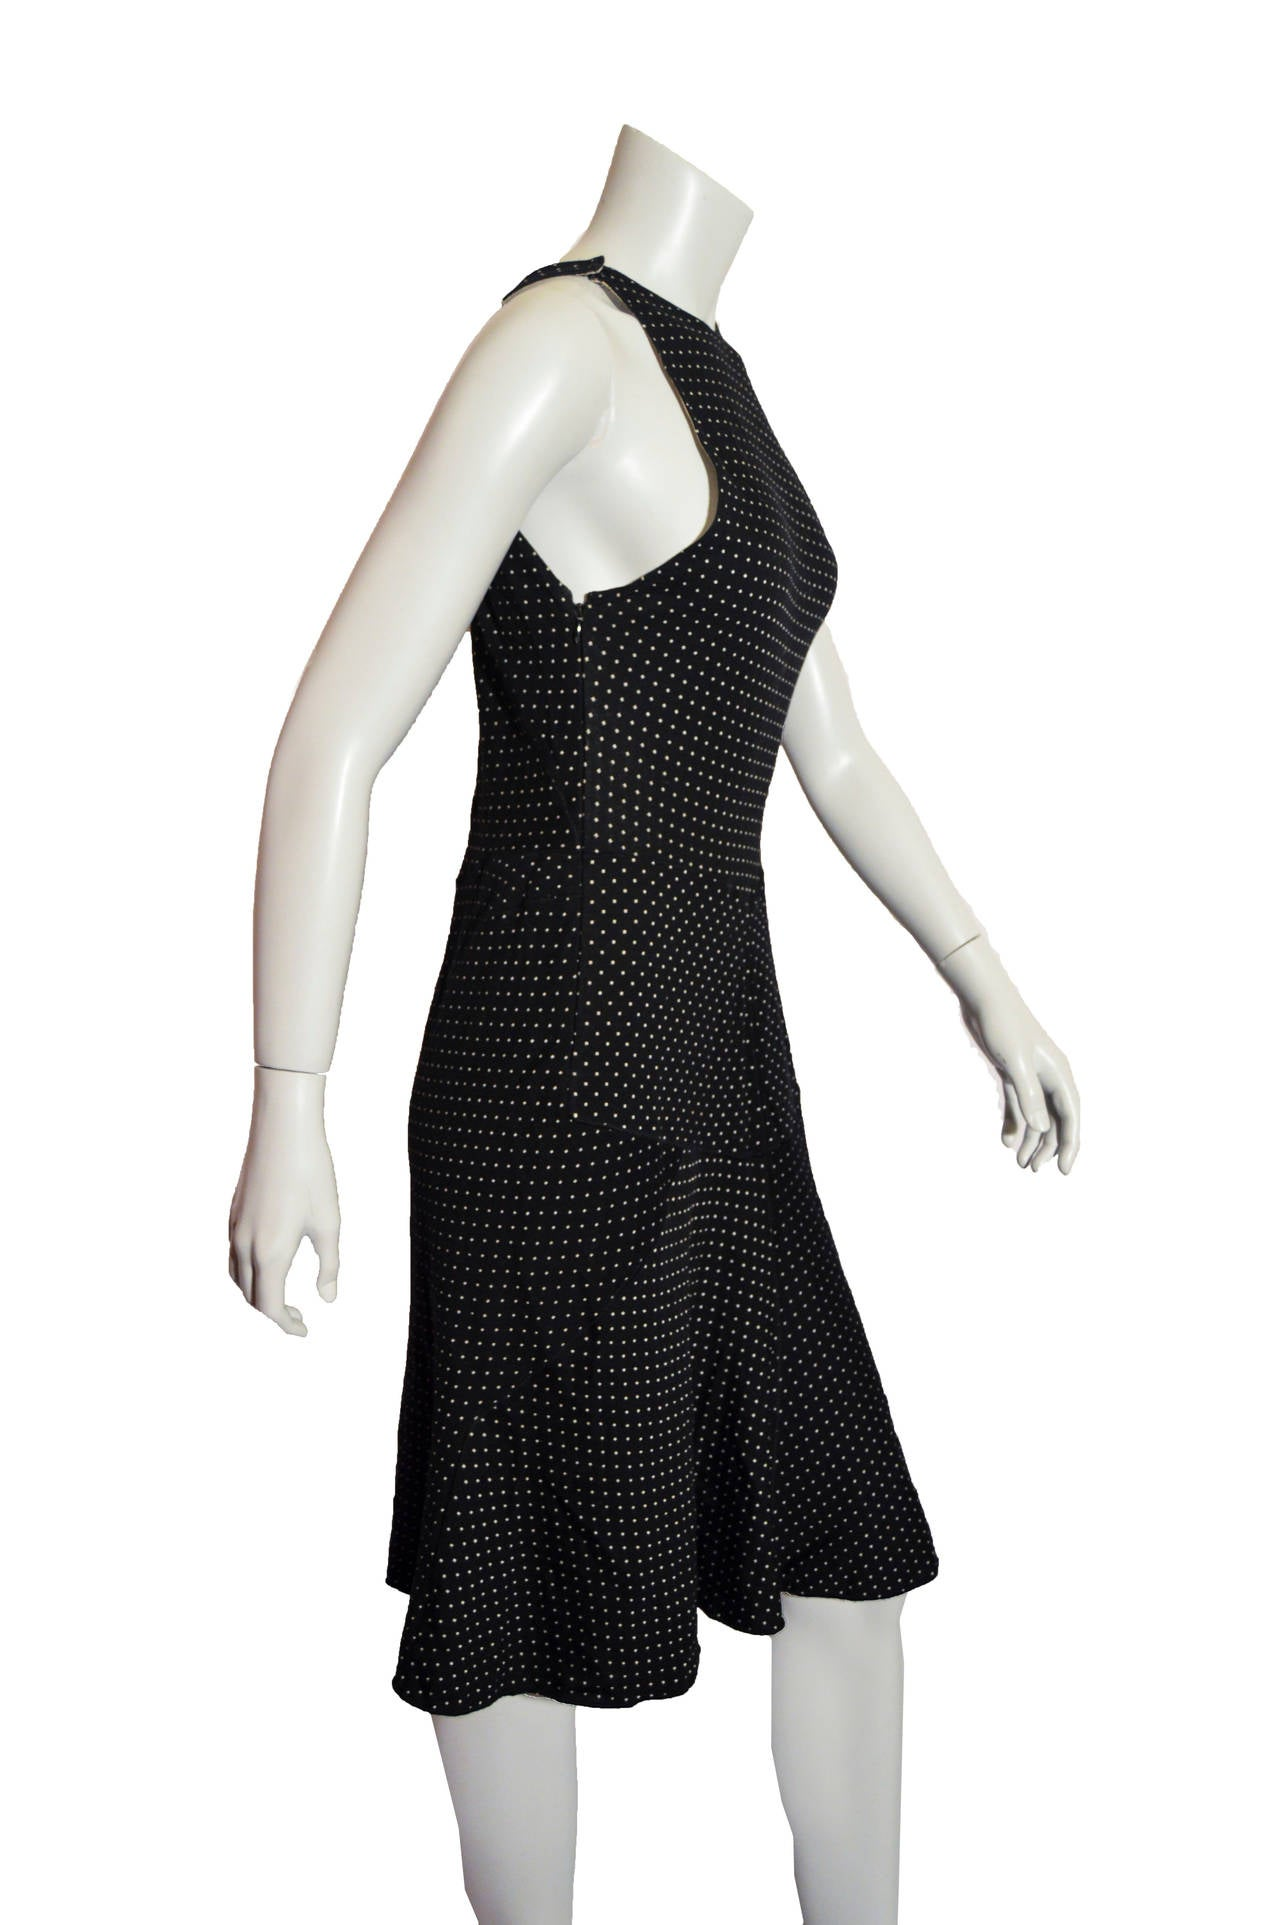 Alaia Polka Dot Body-Con Dress in Black In Good Condition For Sale In San Francisco, CA